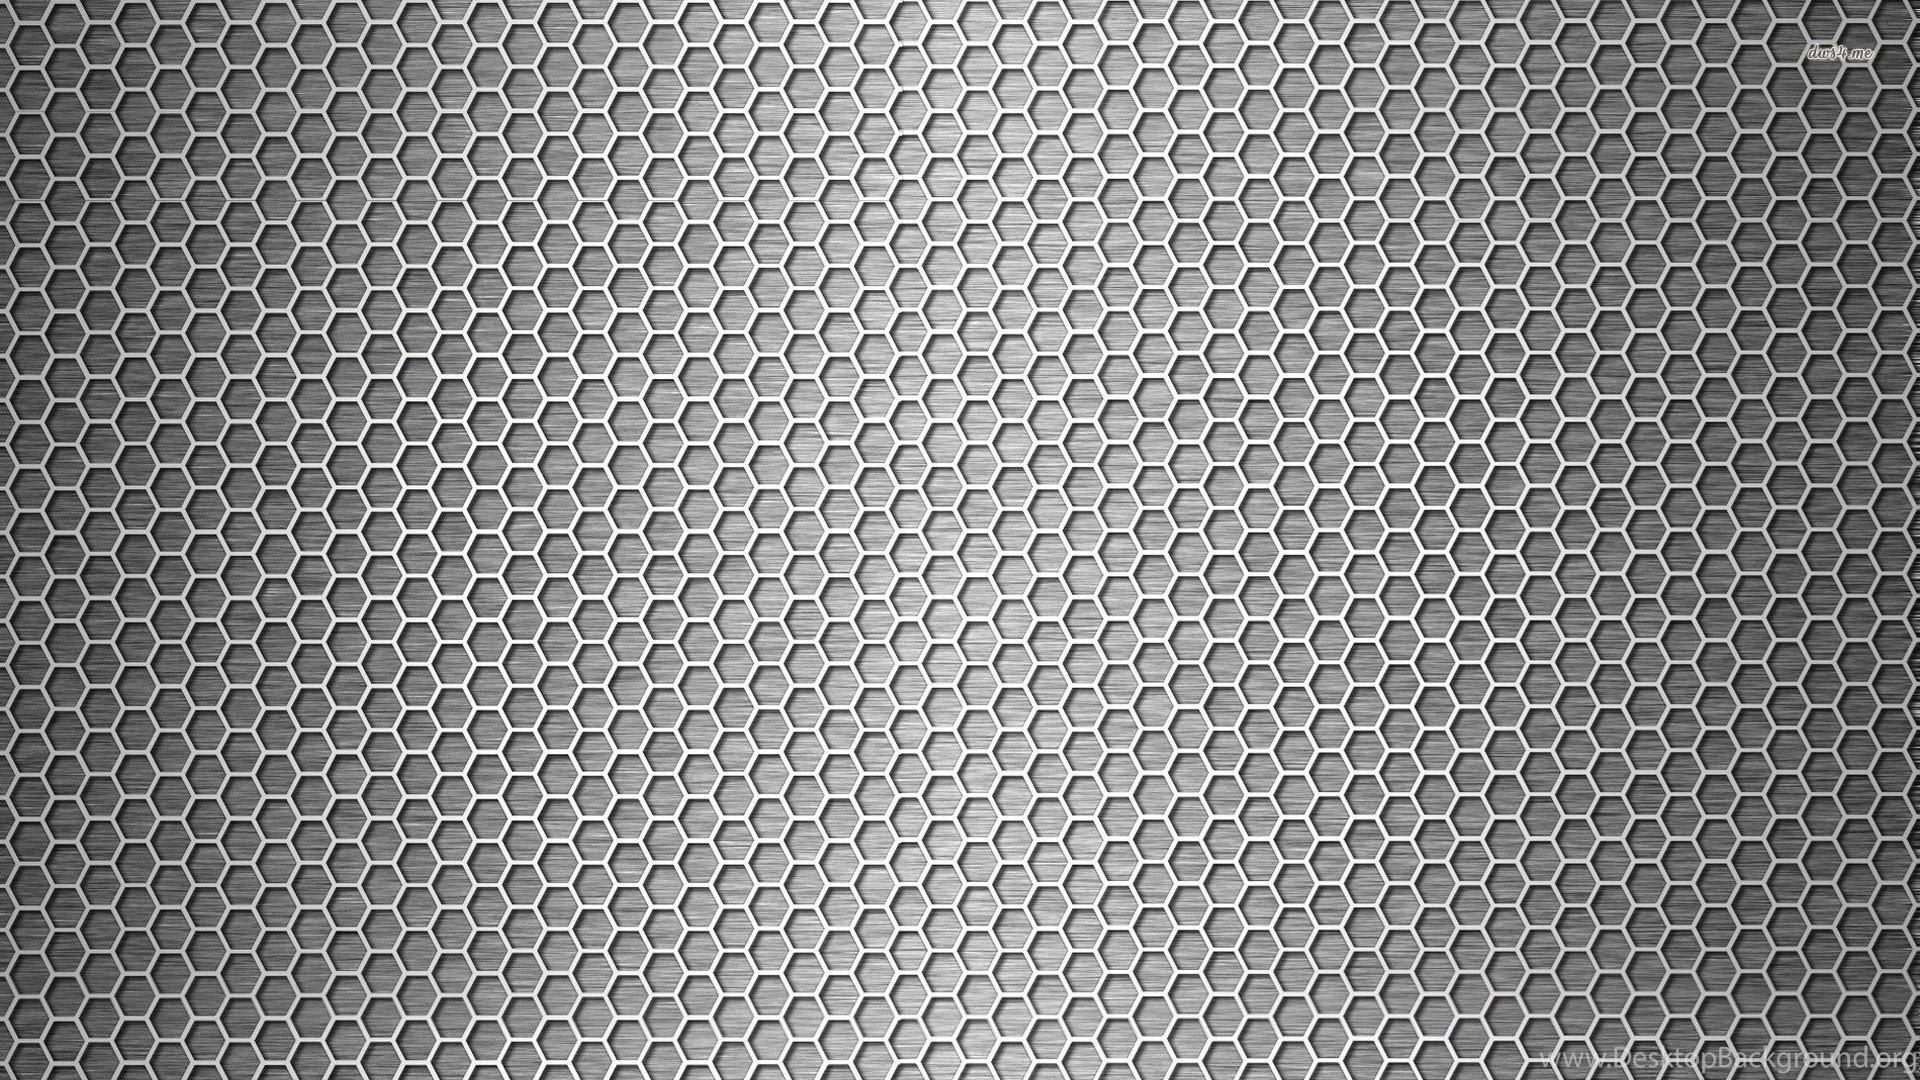 Carbon Fiber Wallpaper Windows 7 (58+ Images